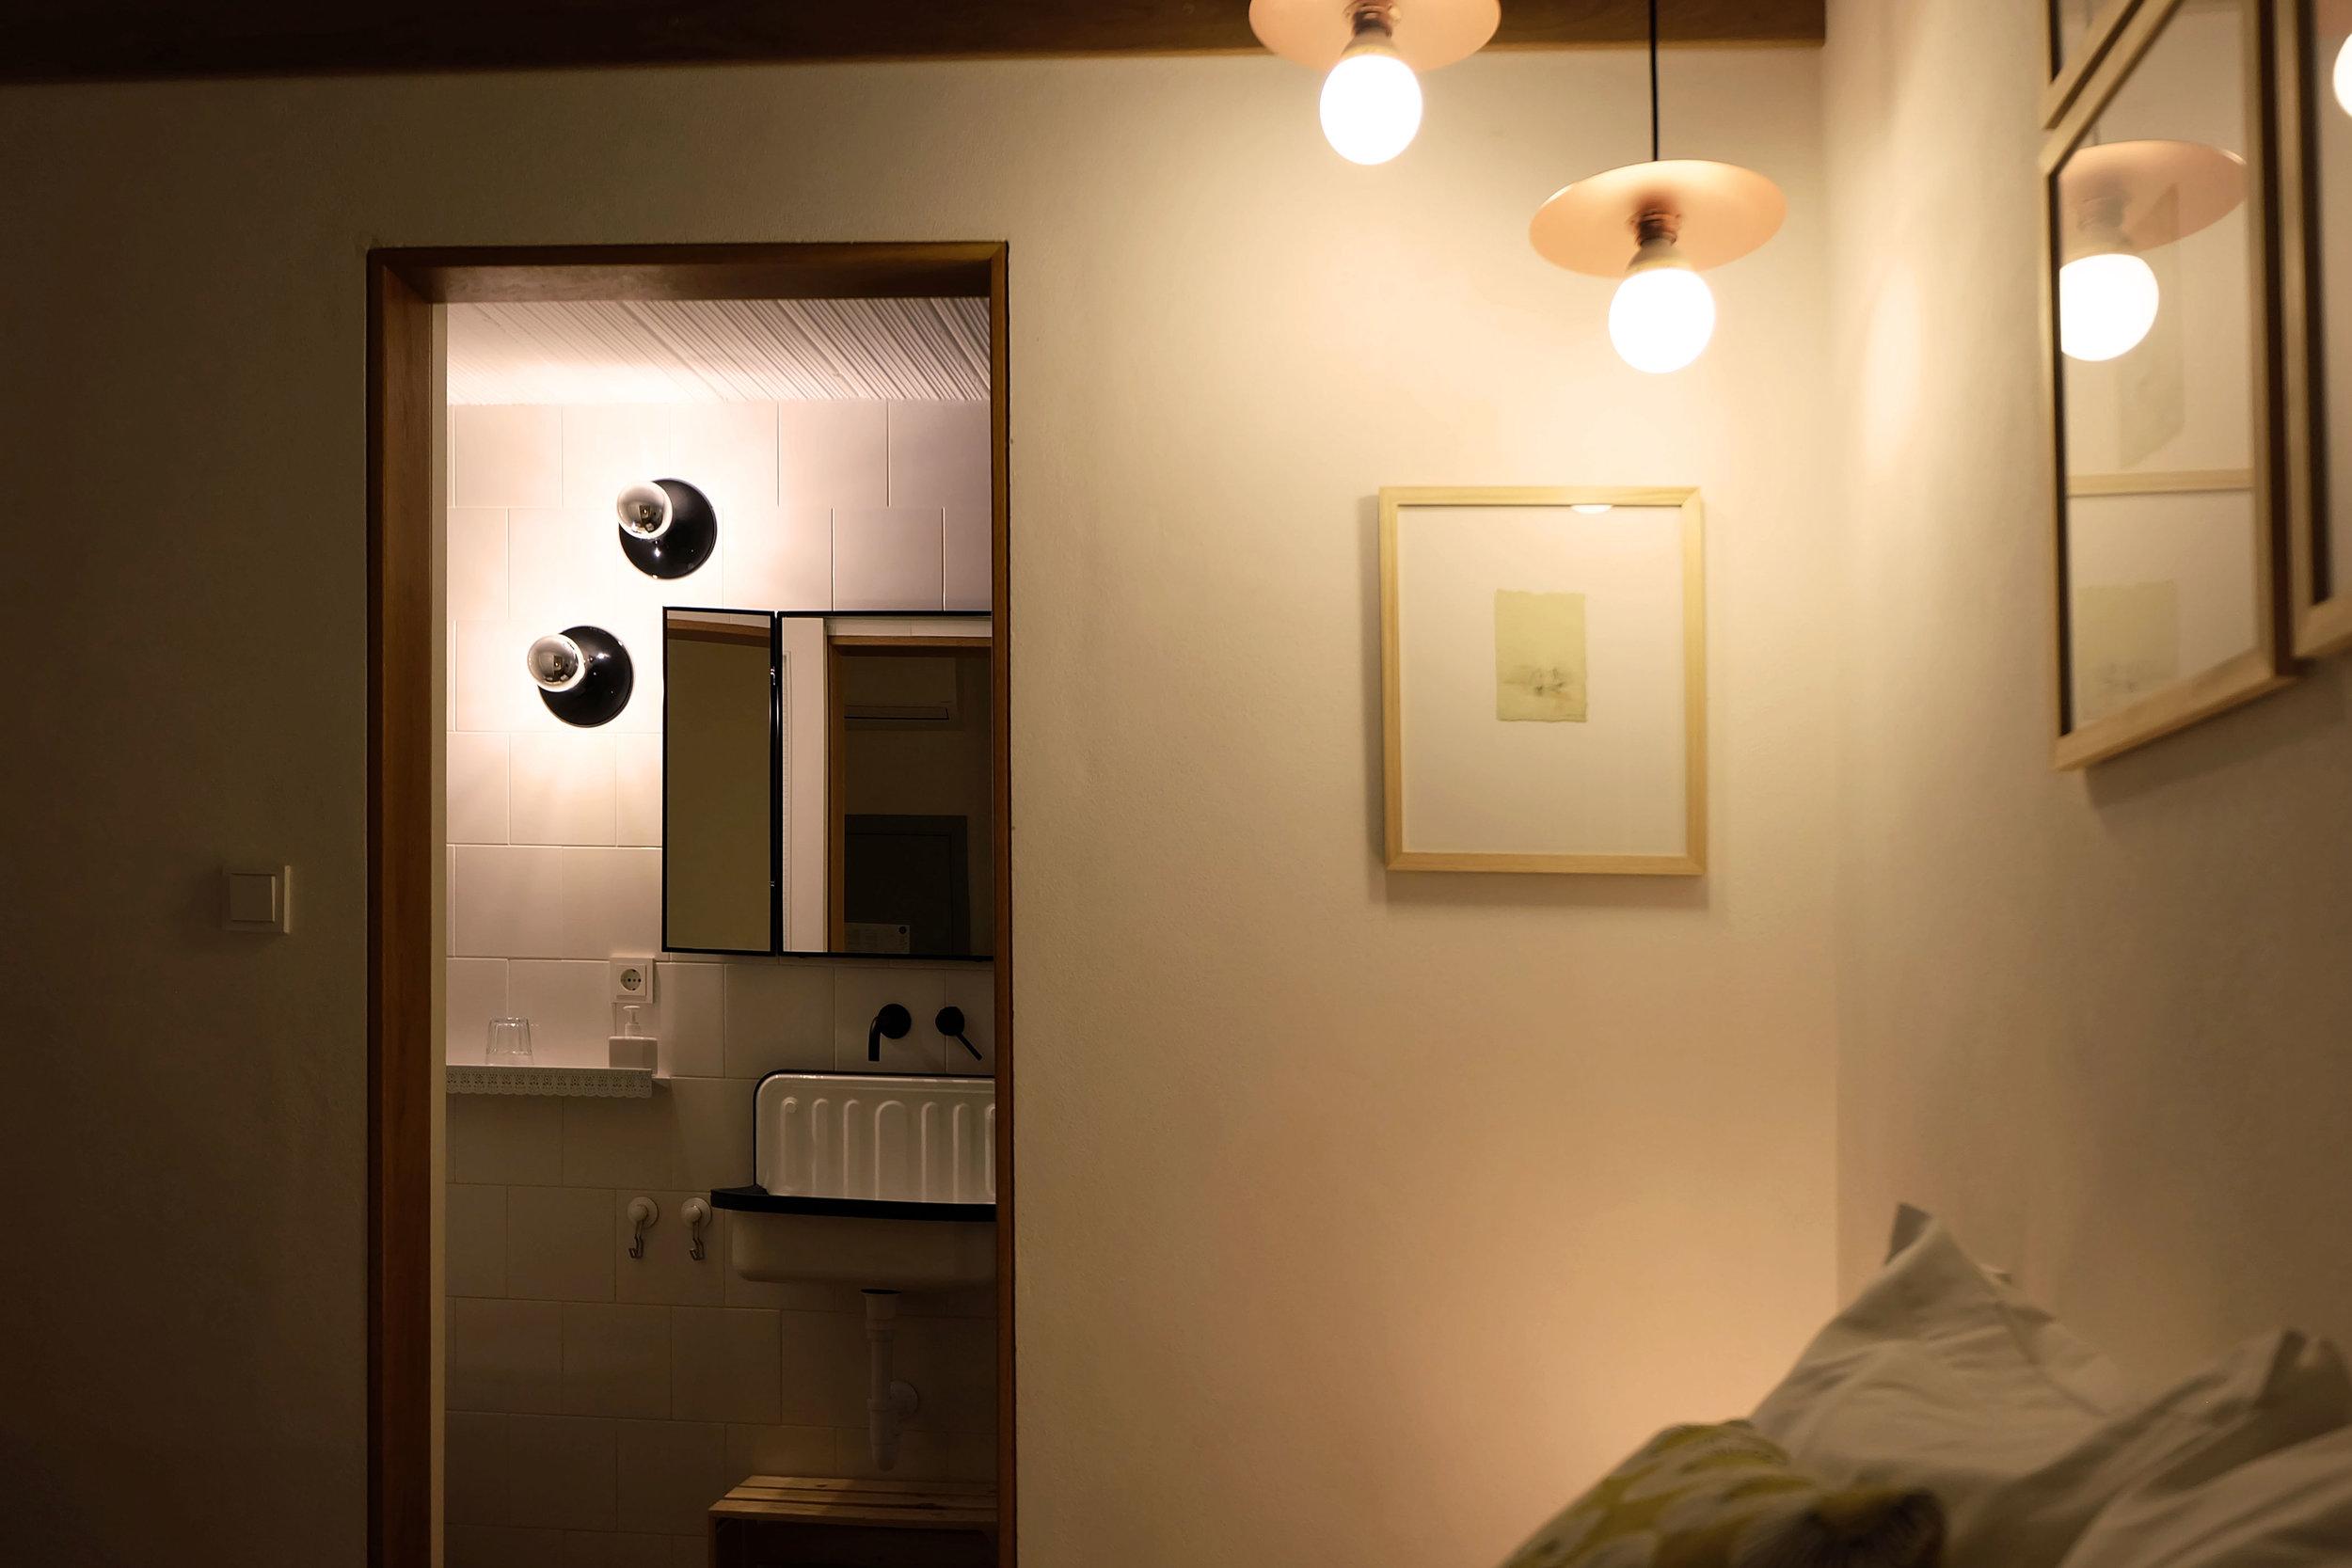 Hotel-Casa-de-Huespedes-Santa-Maria-Habitacion-10-8.jpg